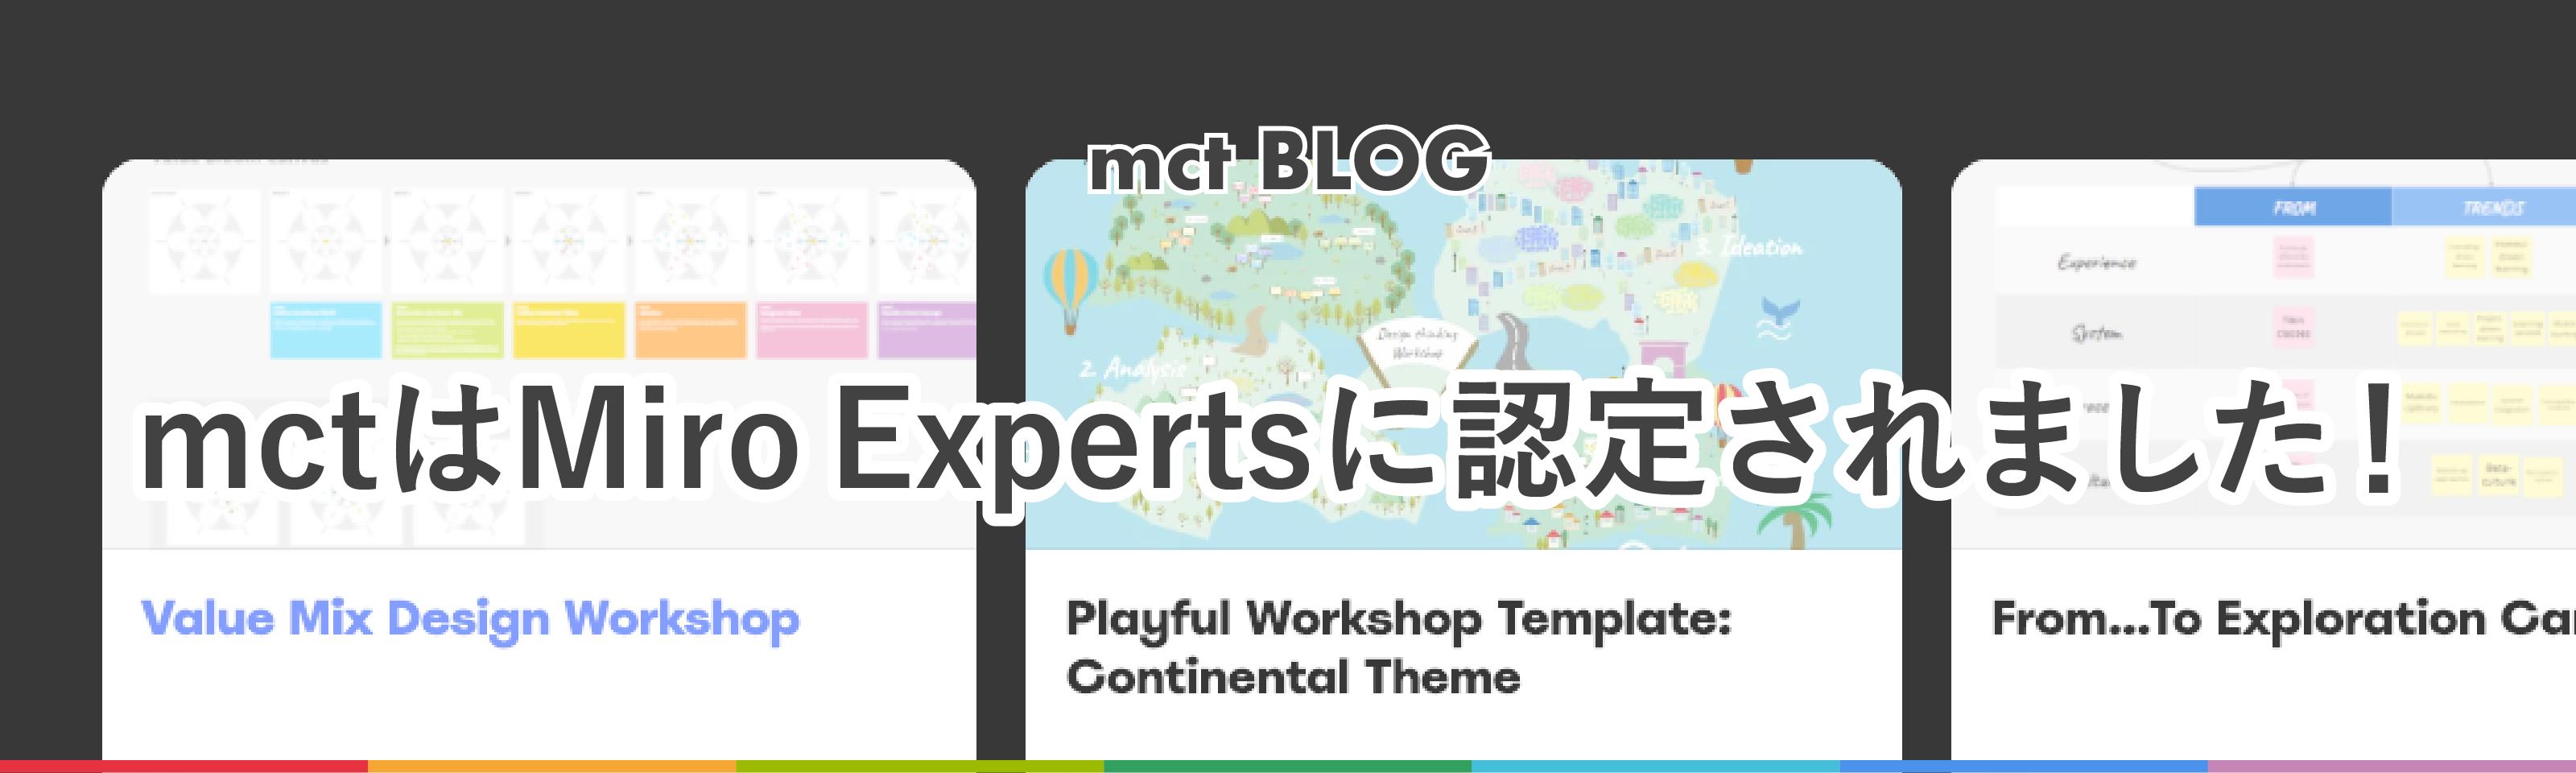 Blog|mctはMiro Expertsに認定されました!